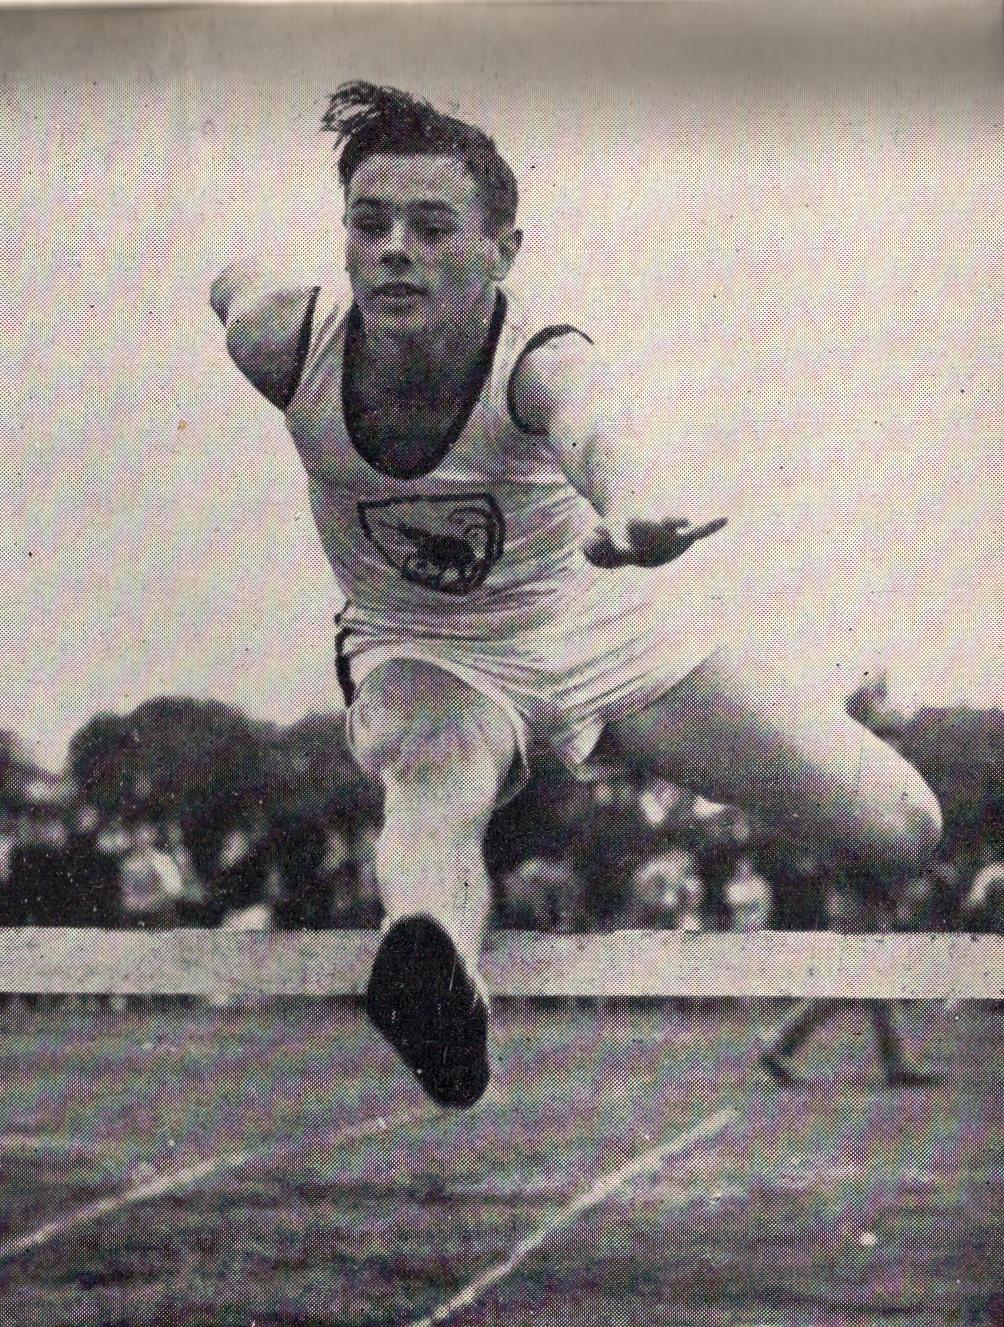 1951 Milham breaks junior hurdles record